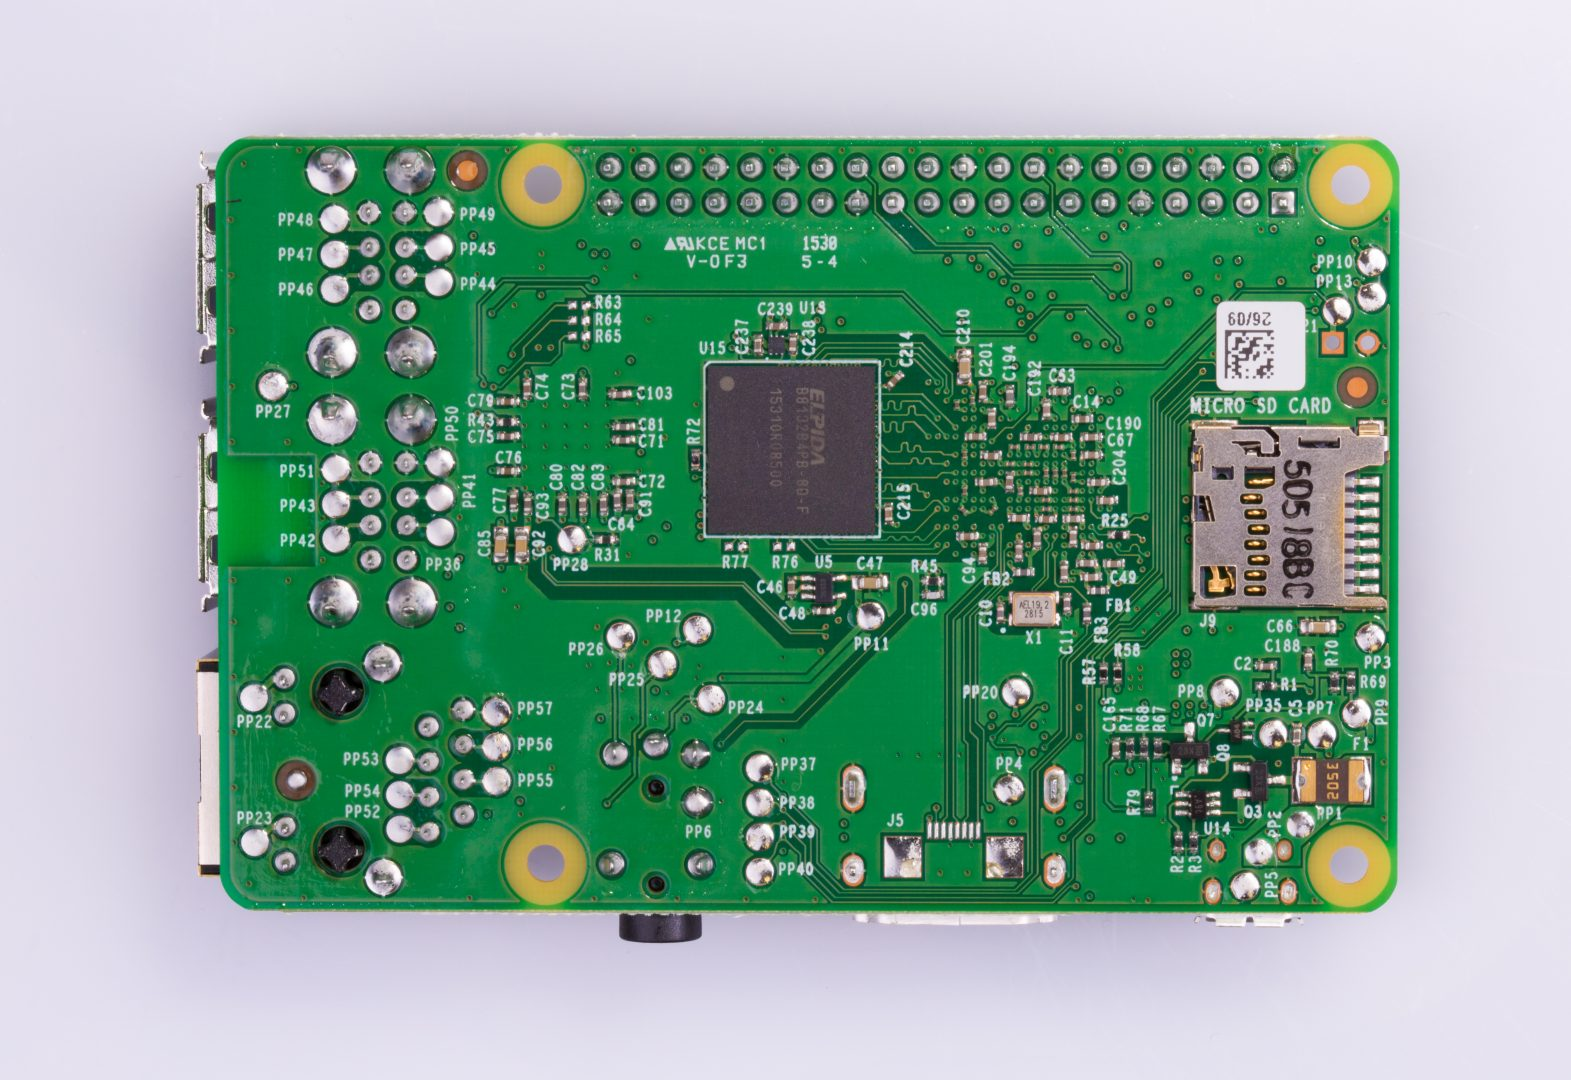 Raspberry Pi 2 Model B - Raspb...